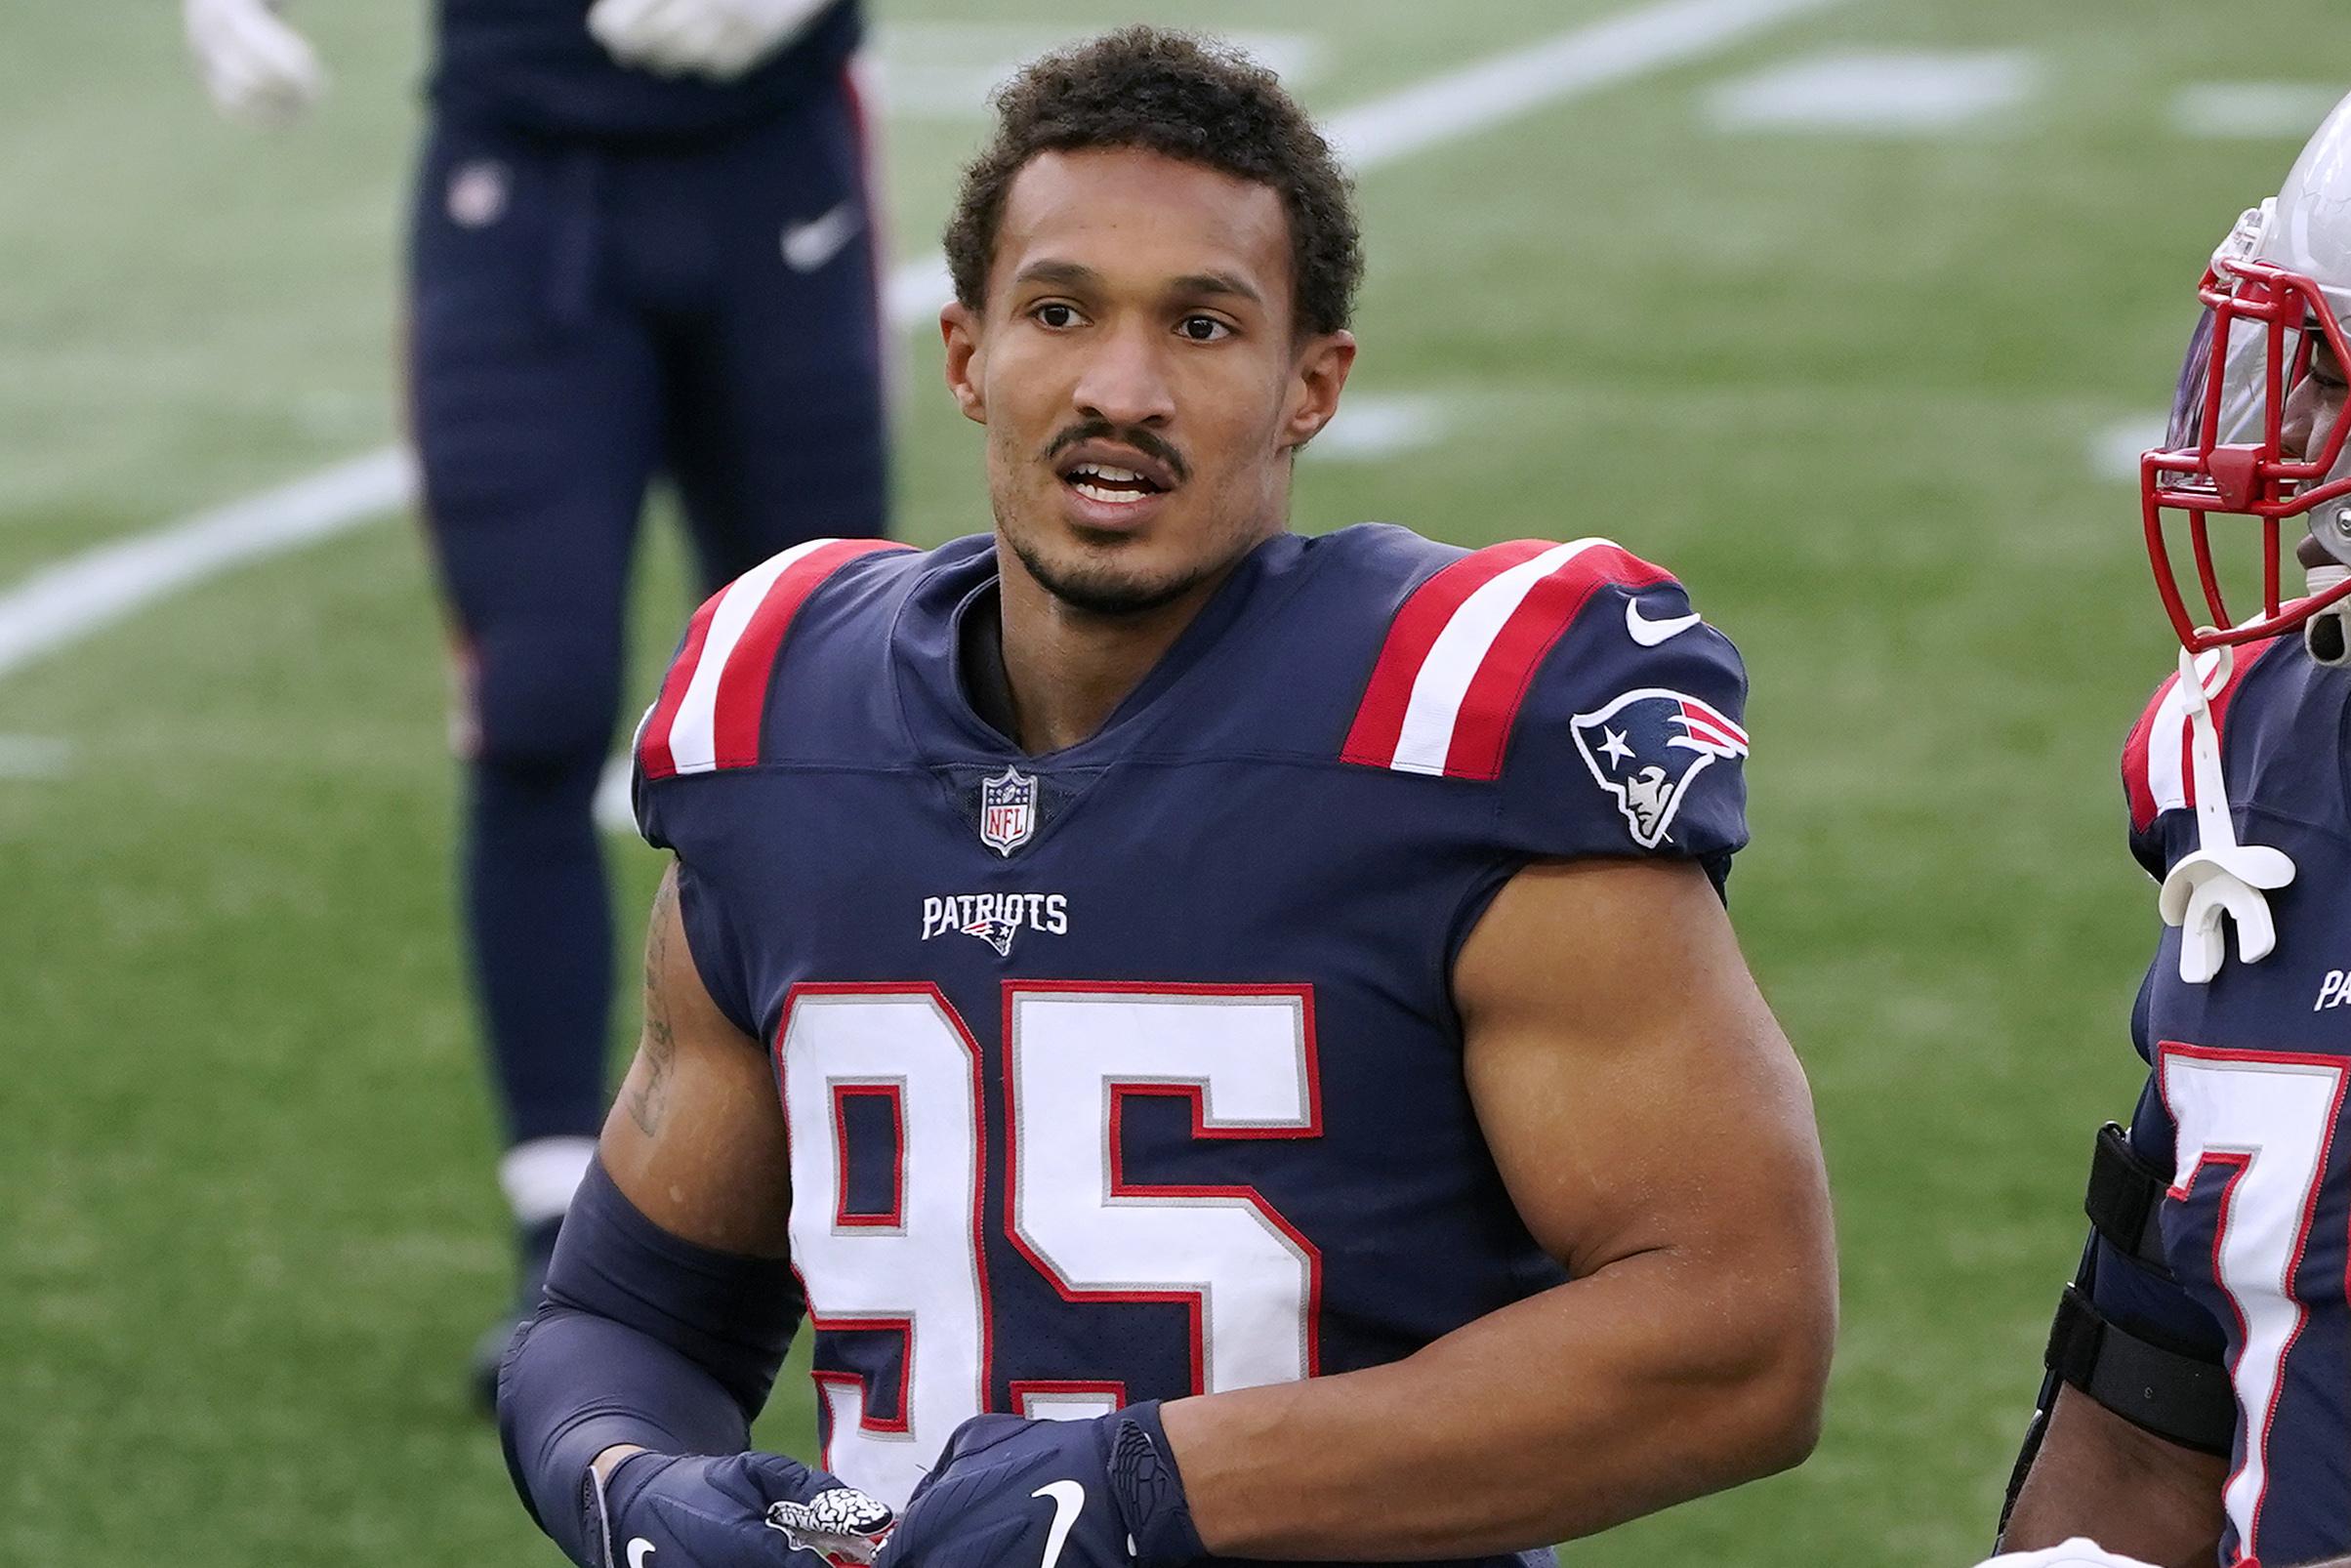 Patriots release former YSU football standout | WKBN.com